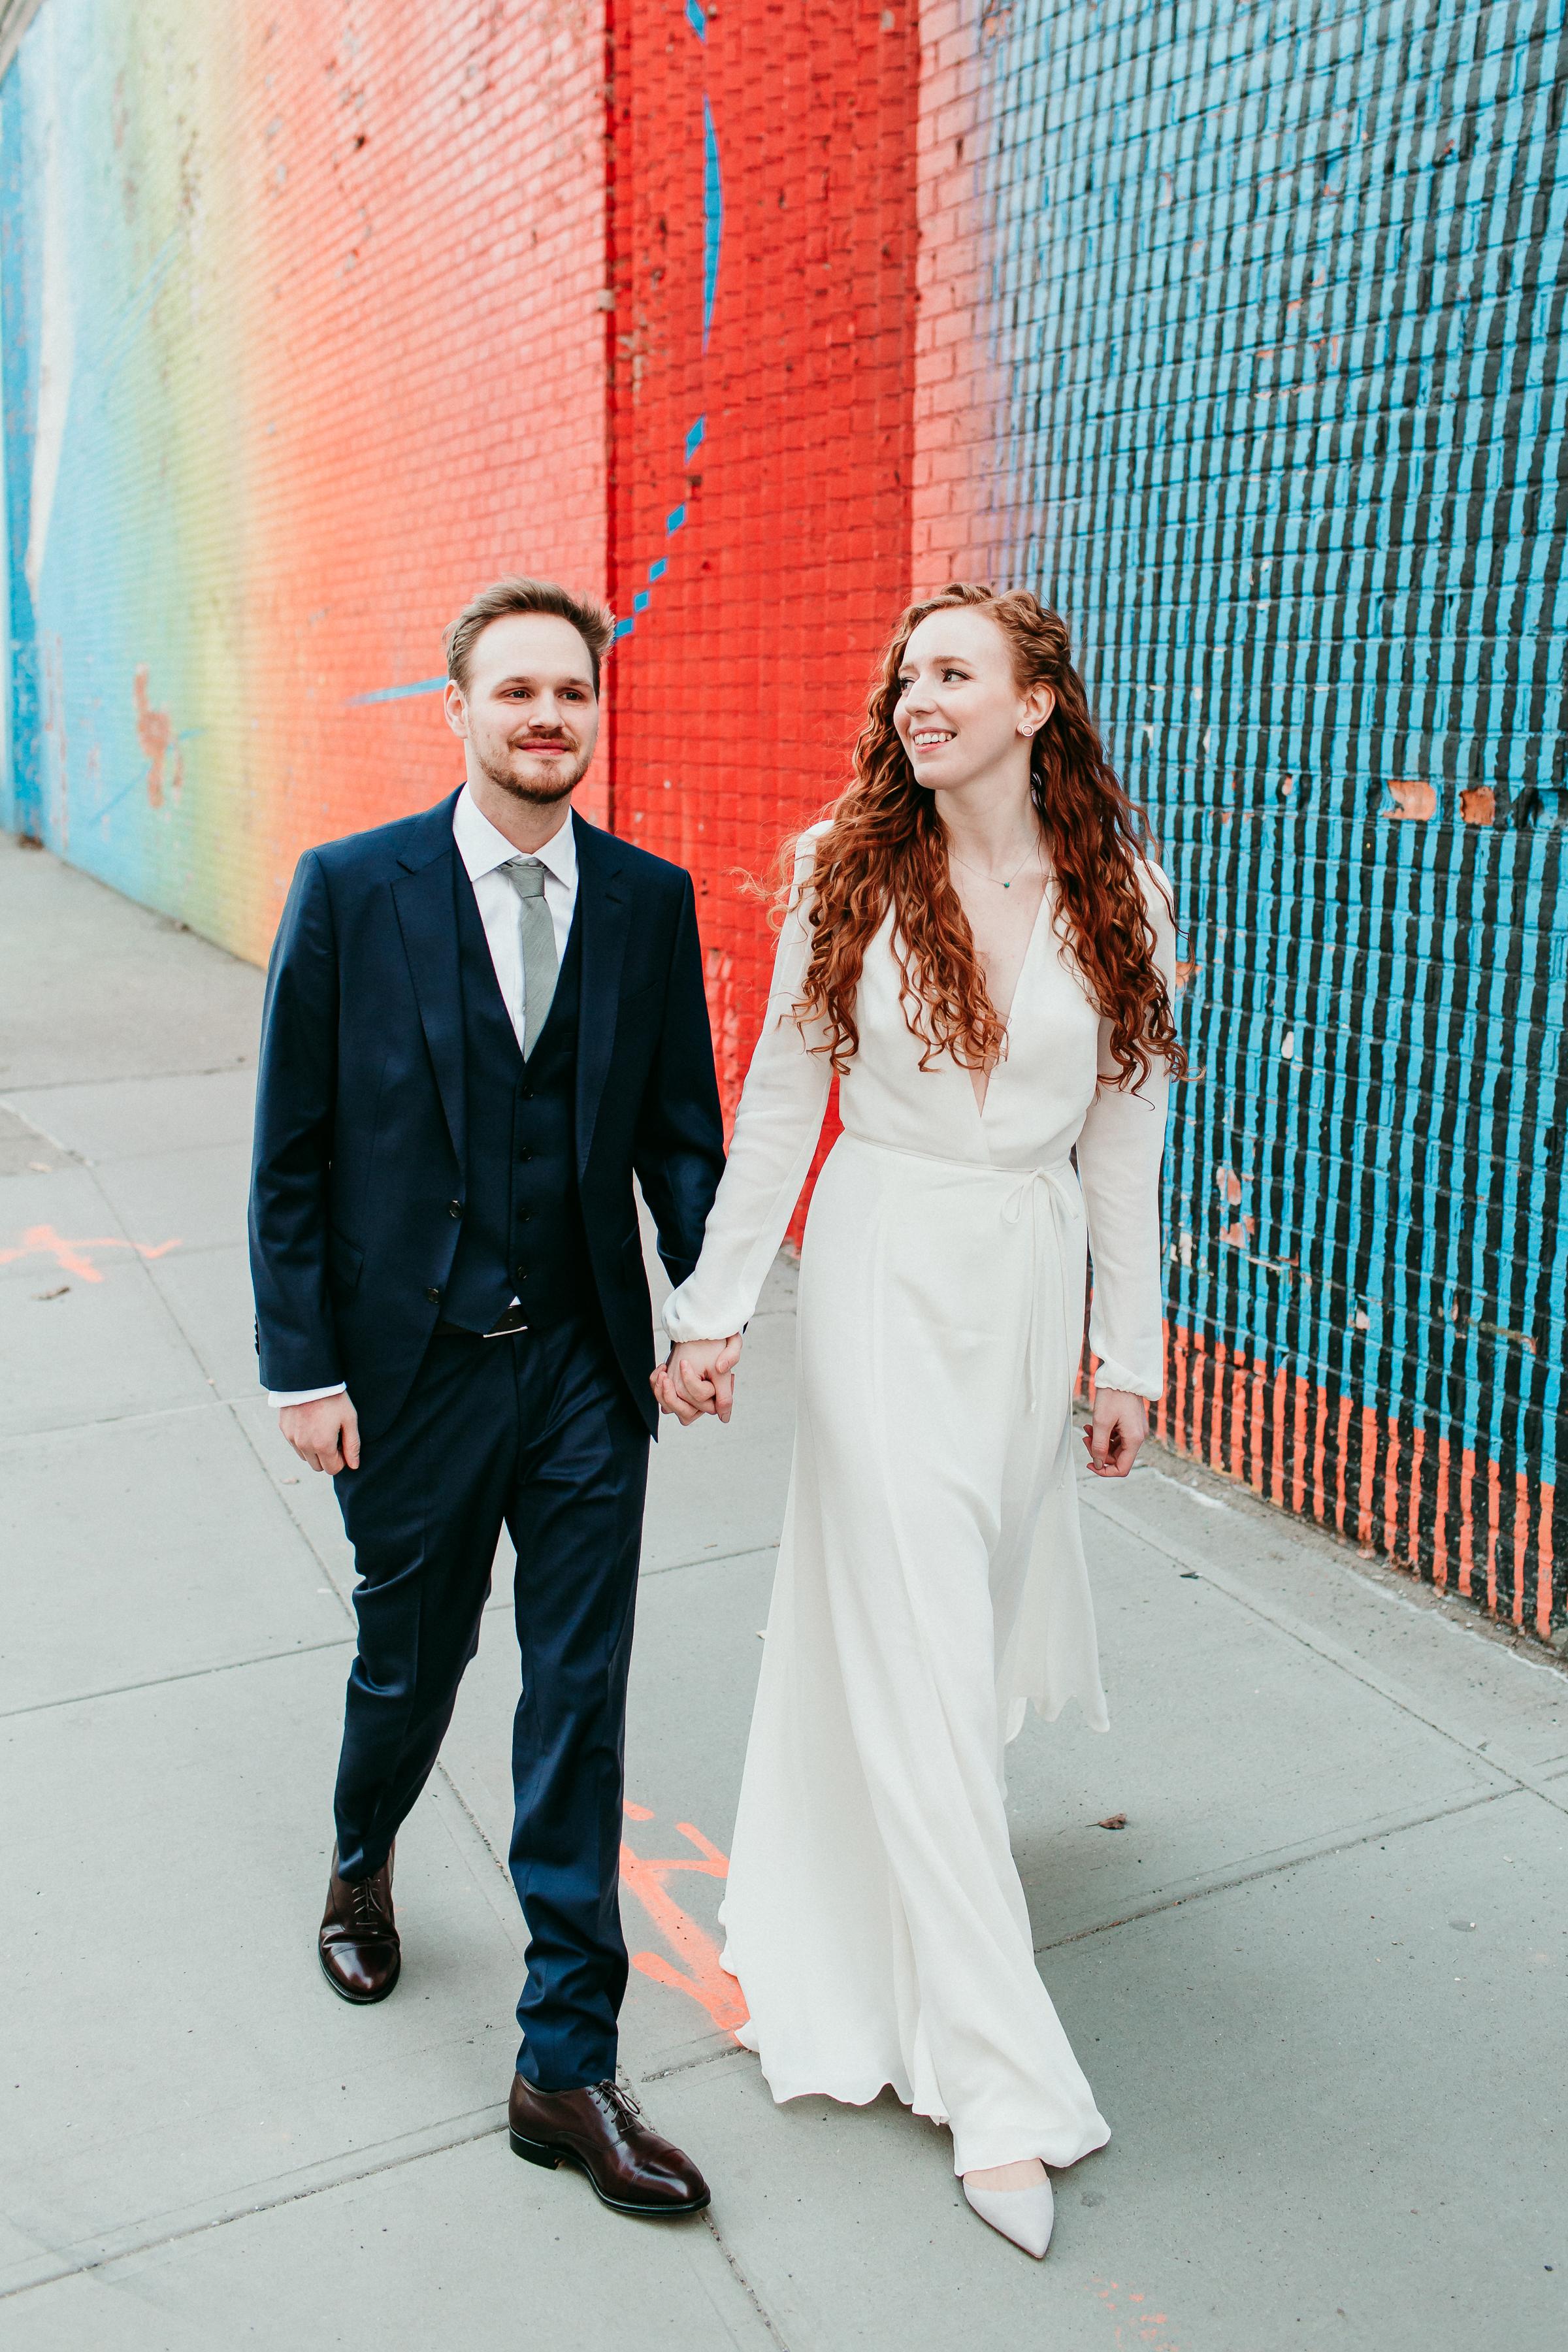 Freemans-Restaurant-Soho-Brooklyn-Bridge-Park-Dumbo-Documentary-Wedding-Photographer-2.jpg